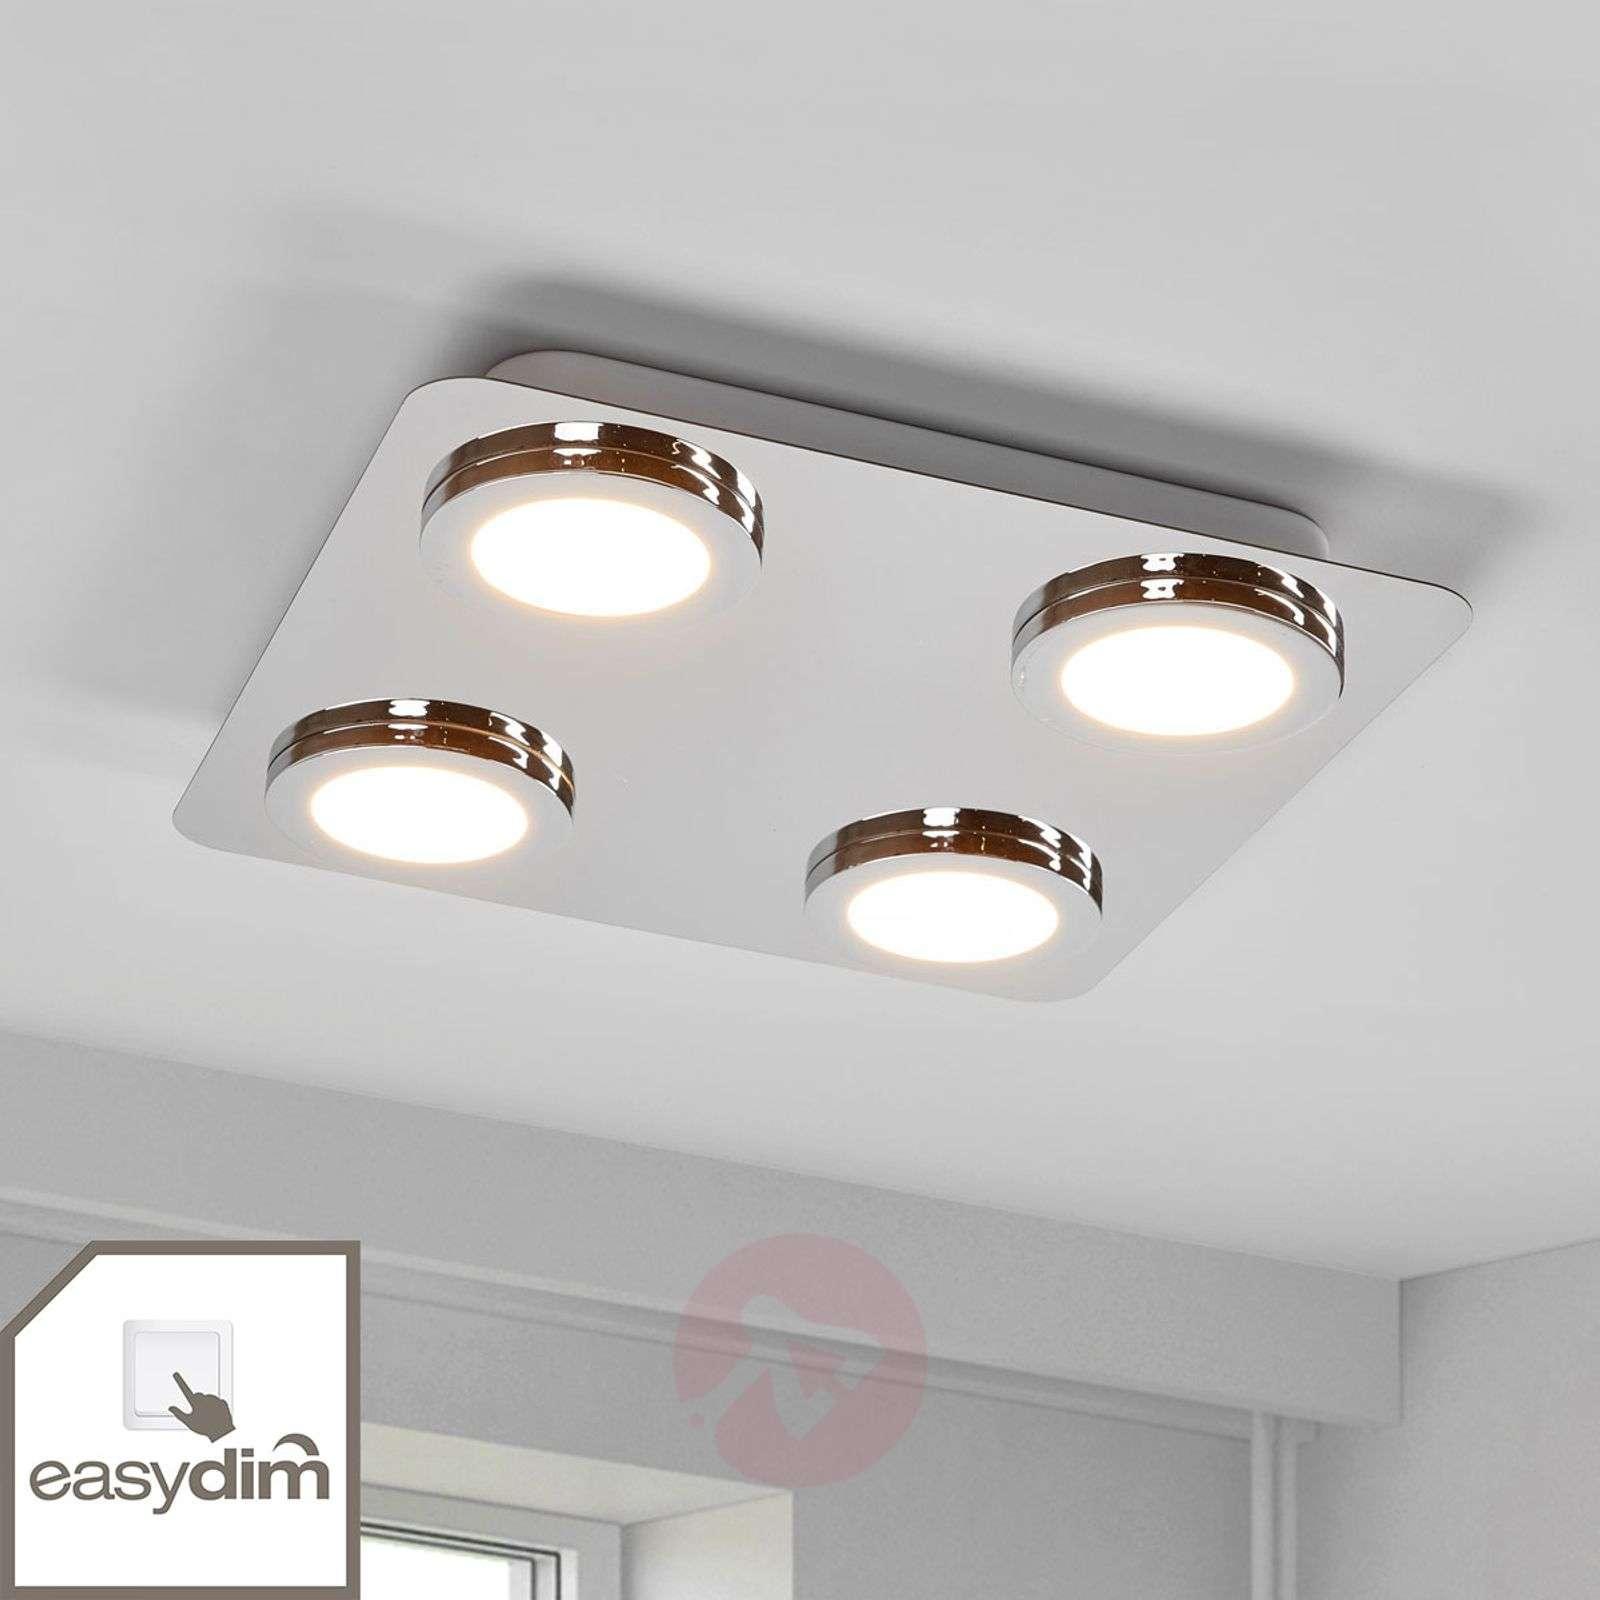 Hilda four bulb easydim ceiling light with led